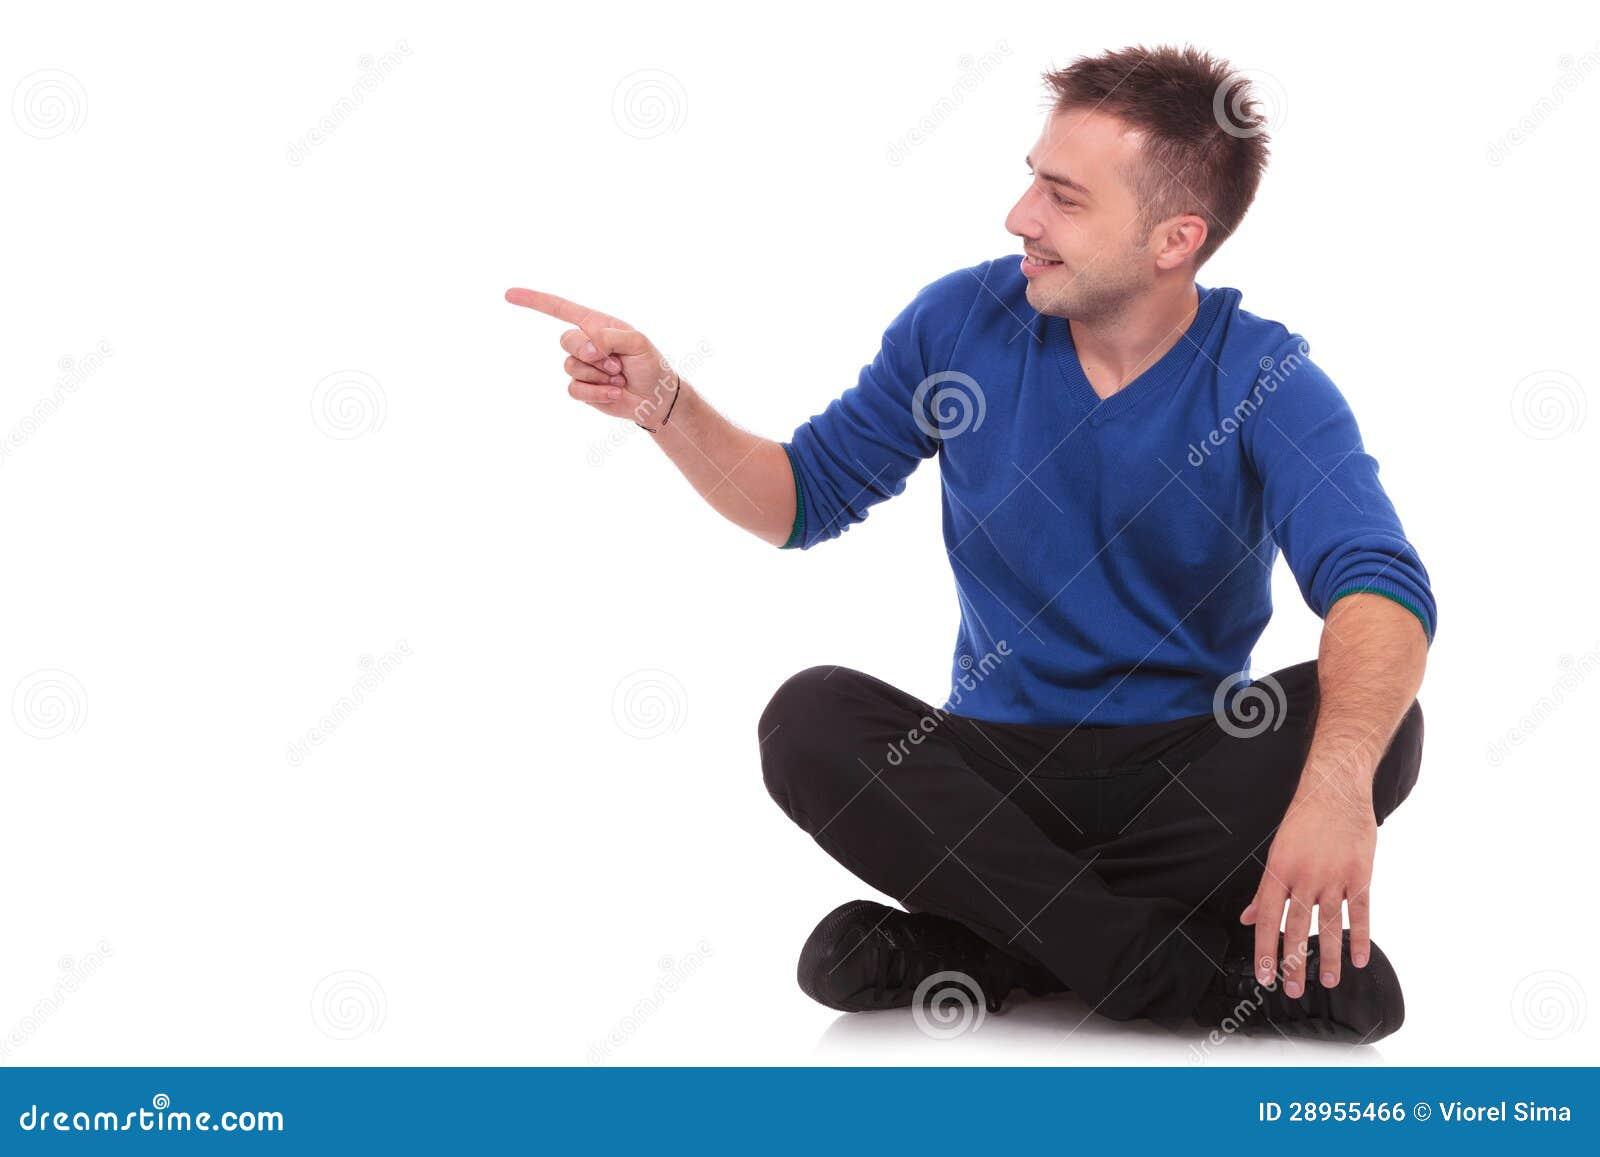 Man sitting on floor